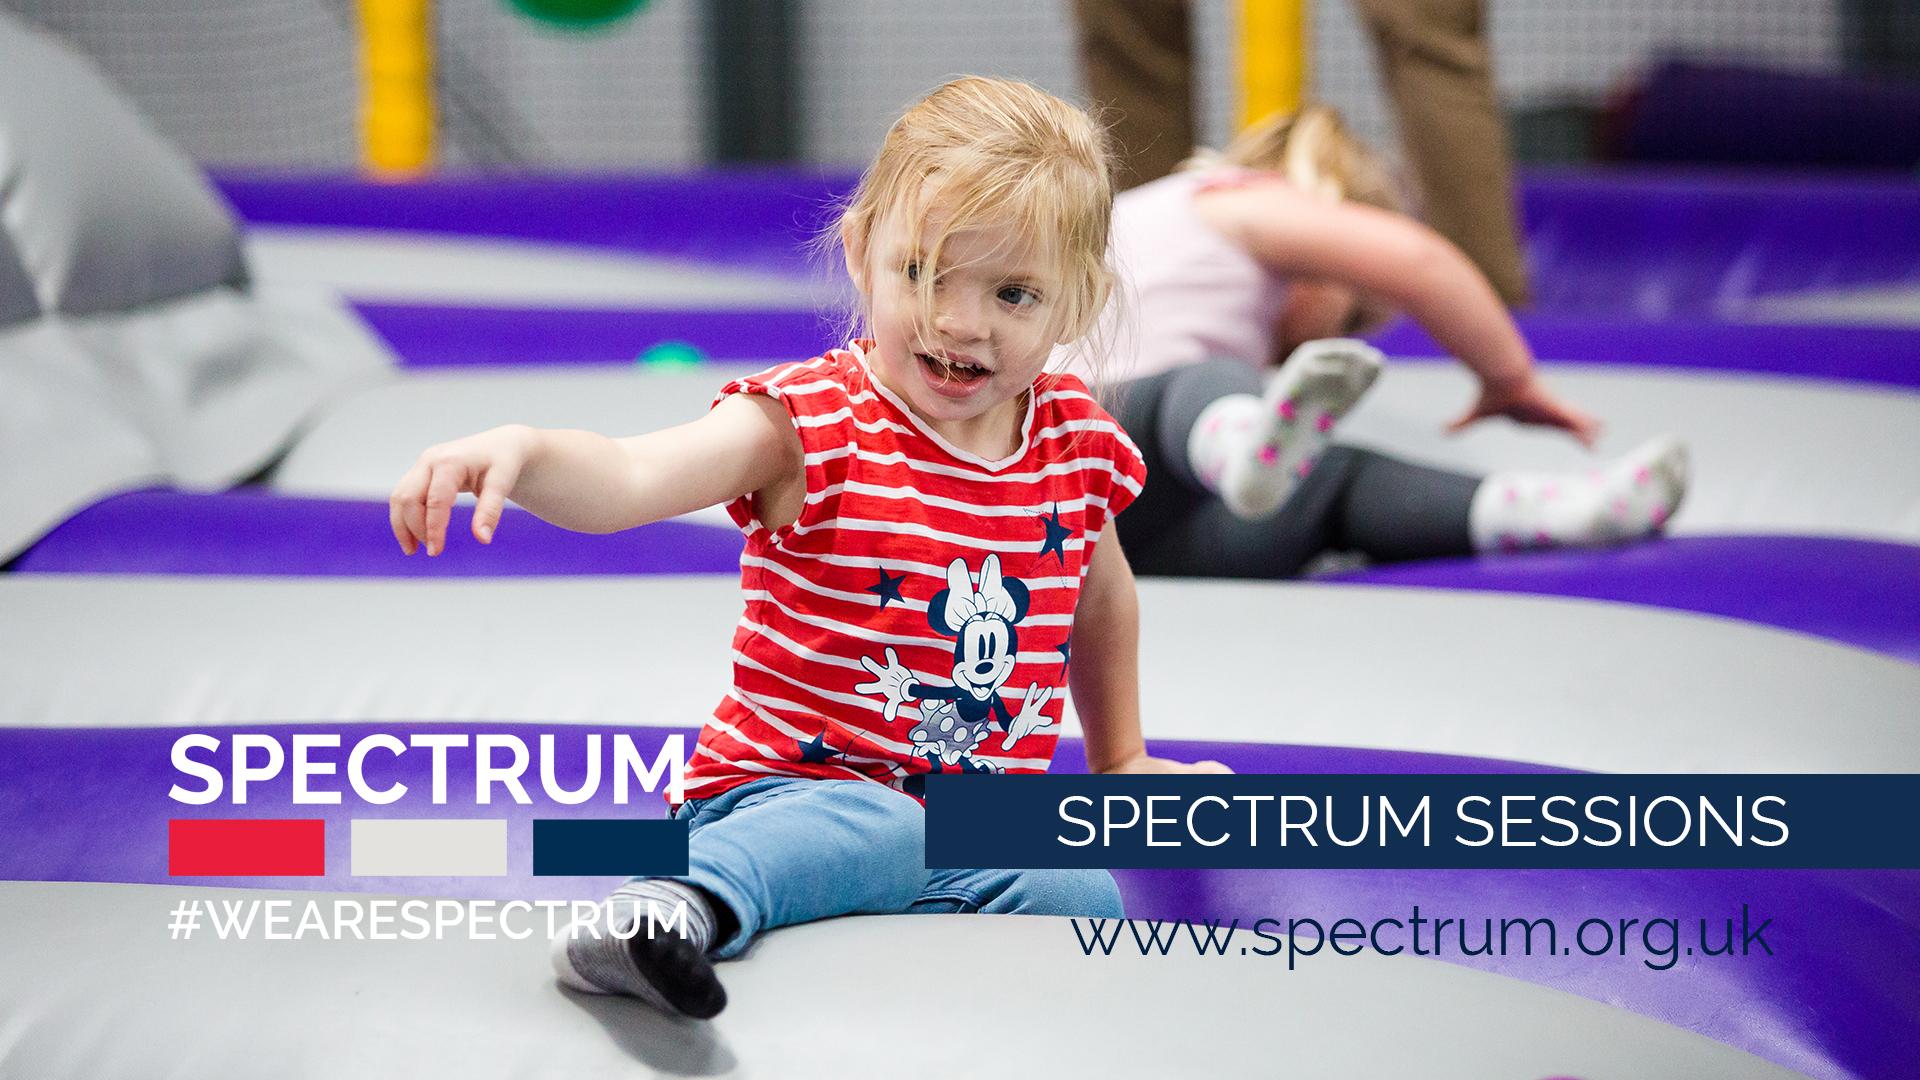 Sessions at Spectrum